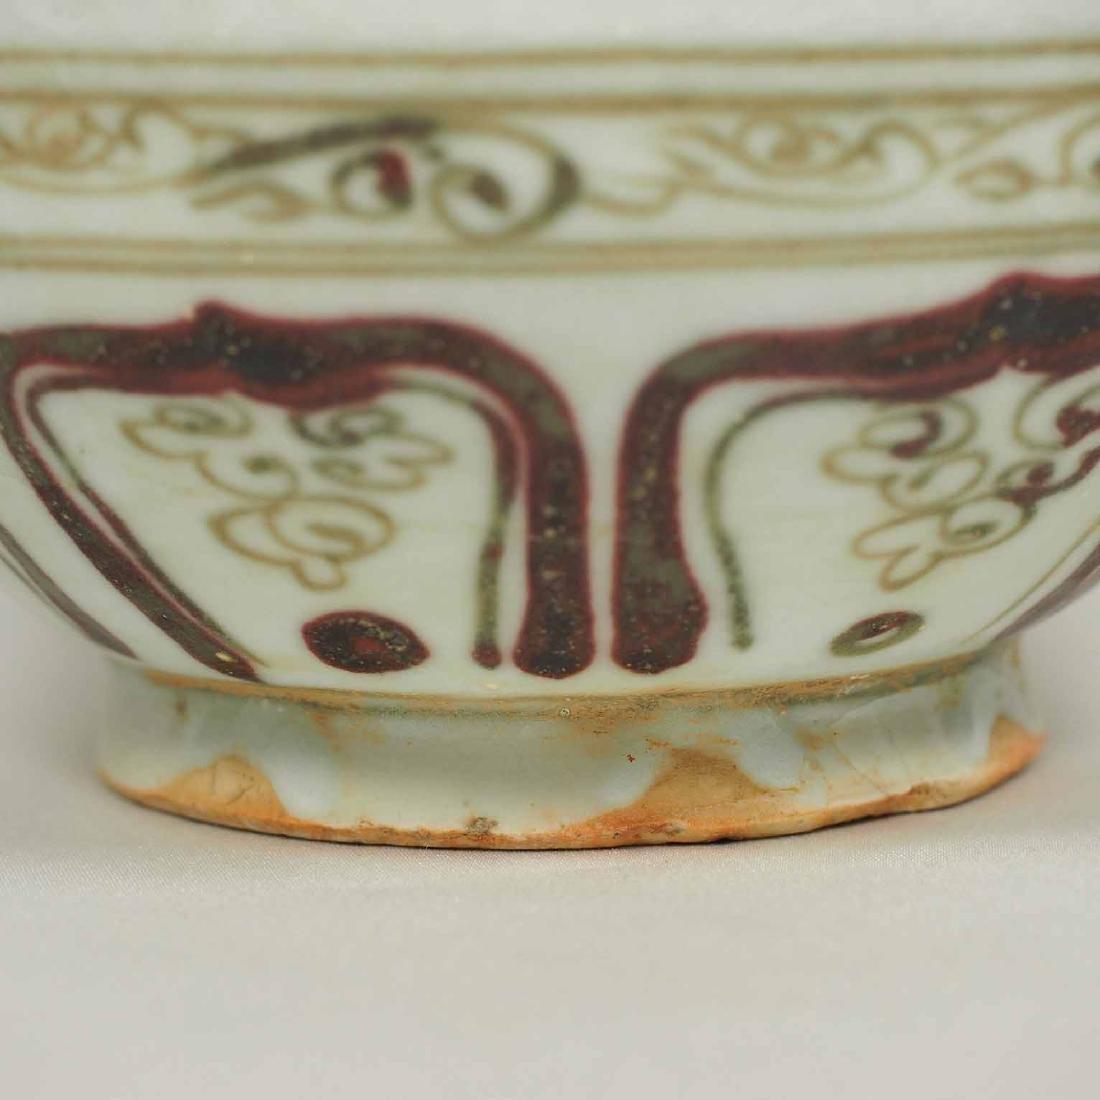 Yuhuchun Vase with Dragon Design, Yuan Dynasty - 7